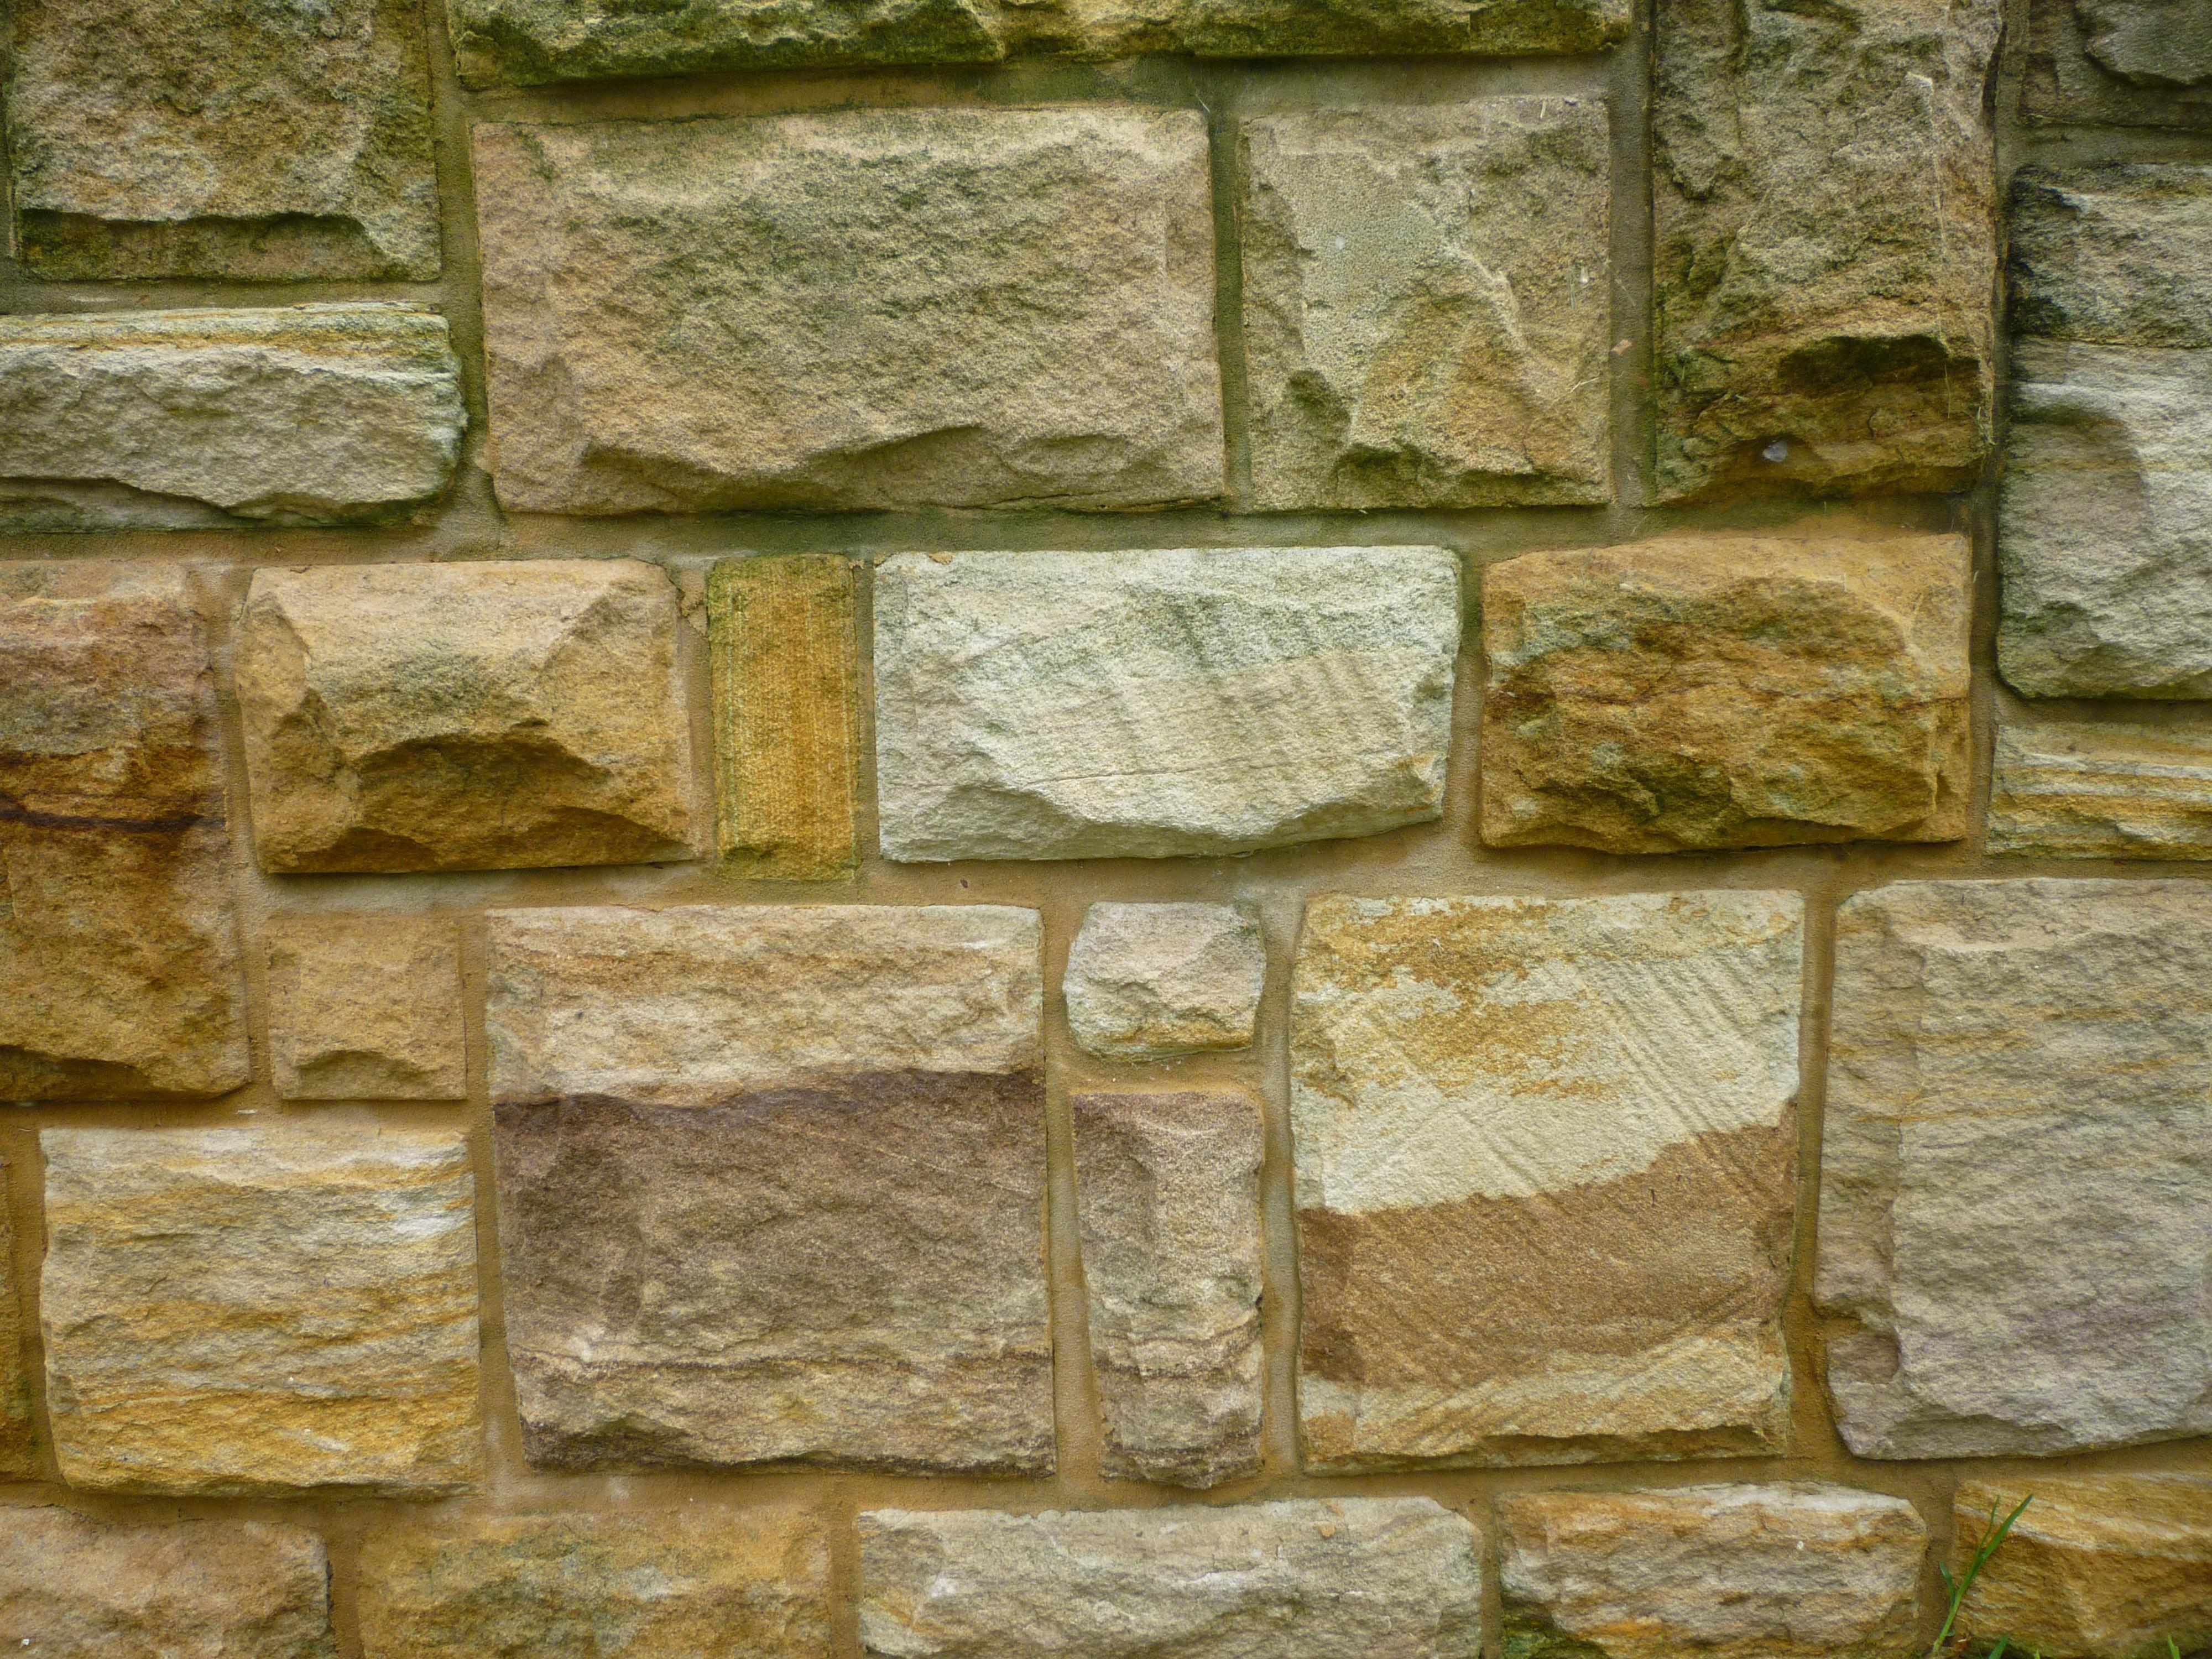 Building Sand Stone : File contemporary use of sydney sandstone g wikimedia